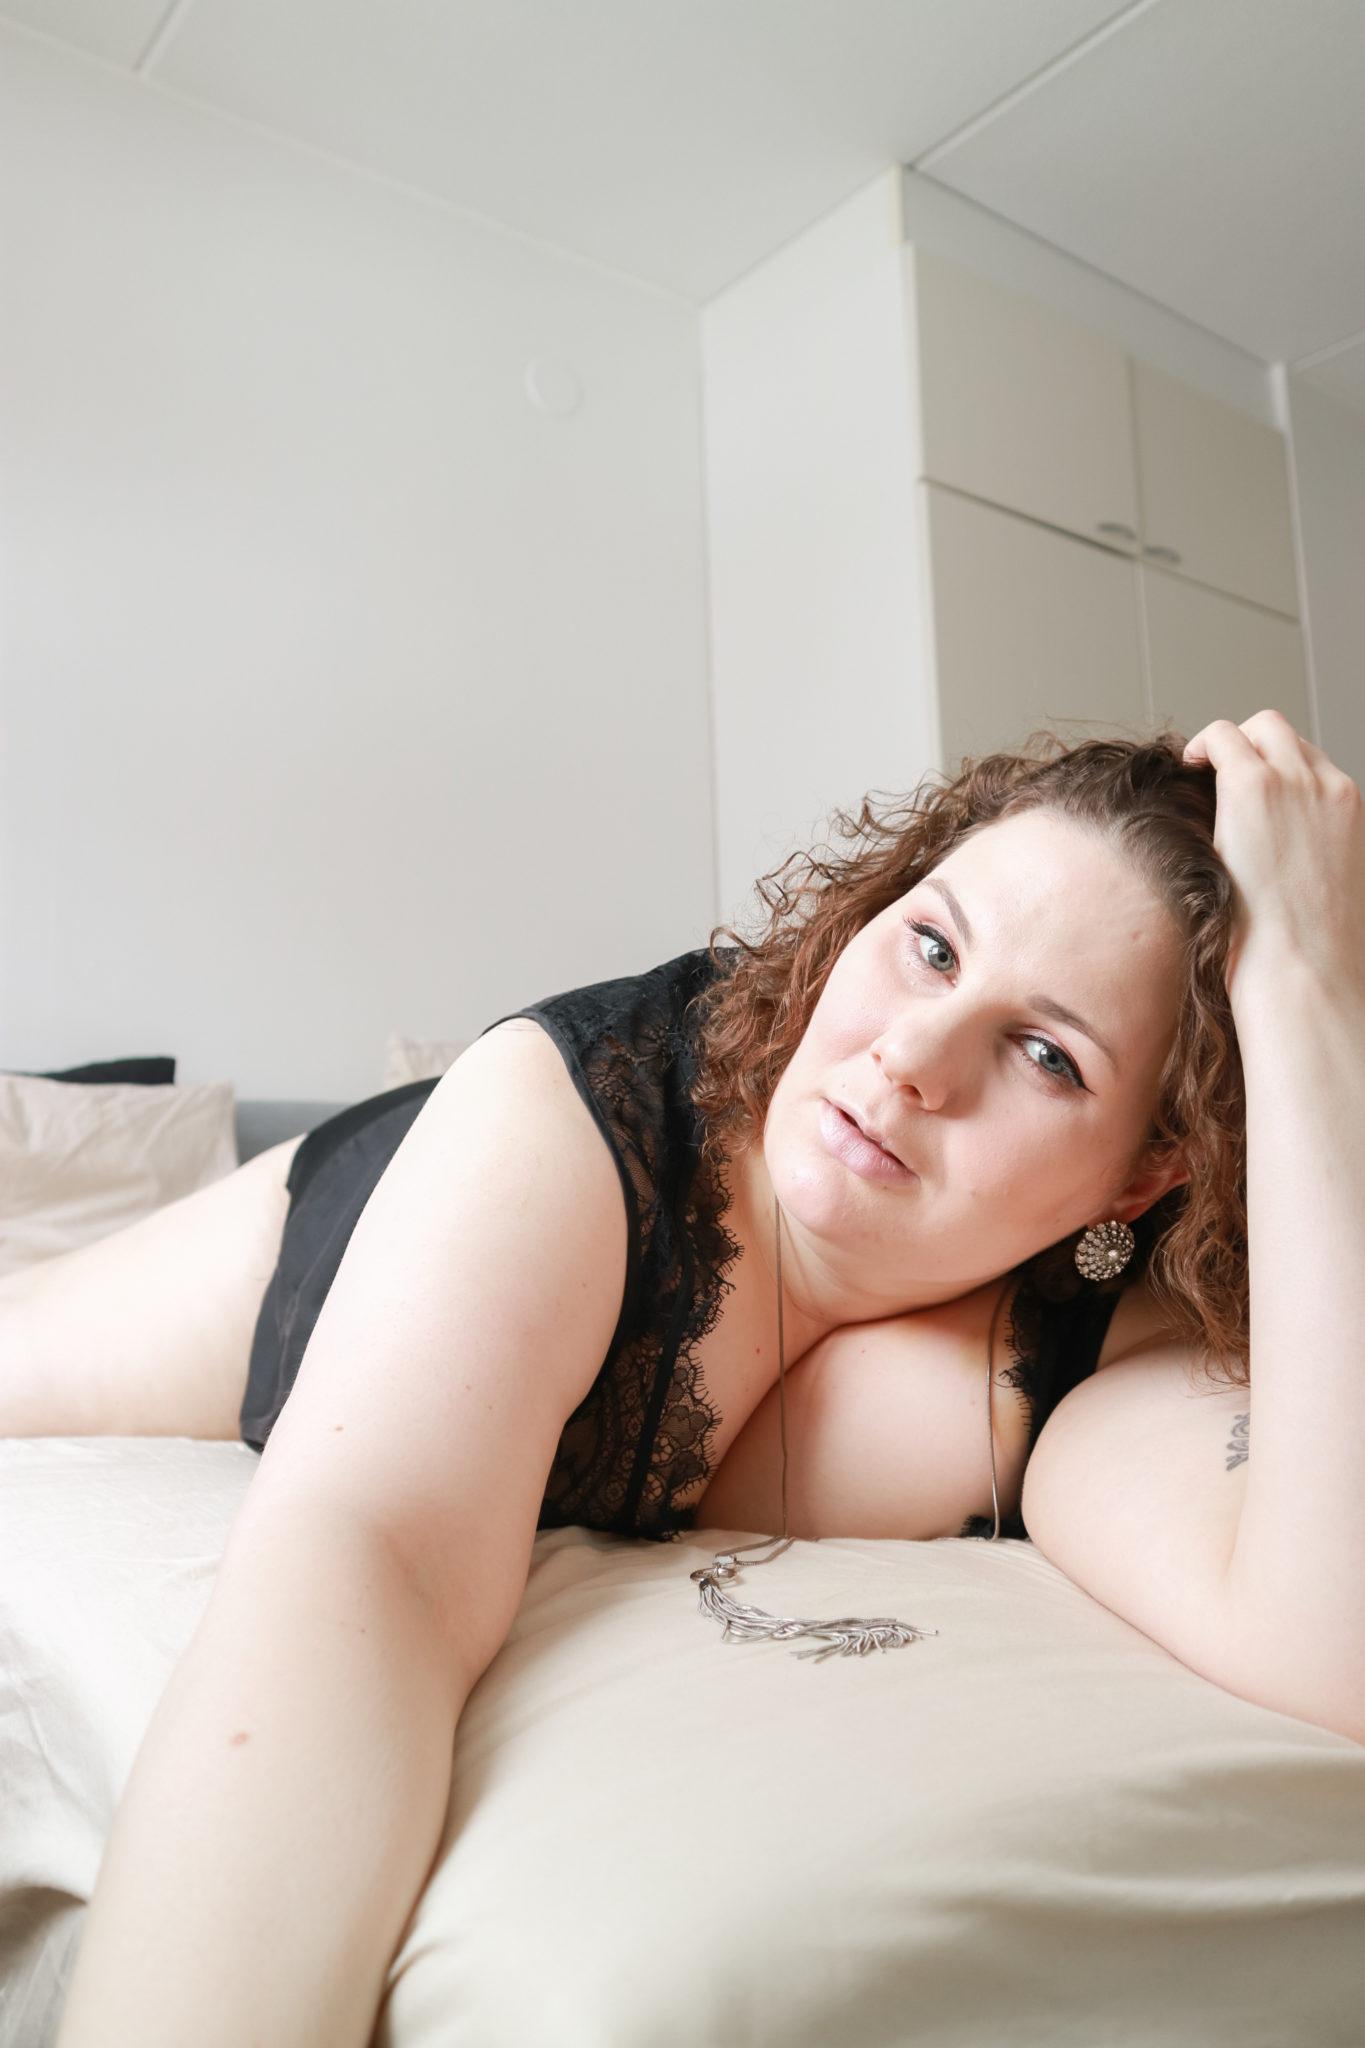 Penetraatio keskeisyys - Big mamas home by Jenni - Vaikuttajamedia